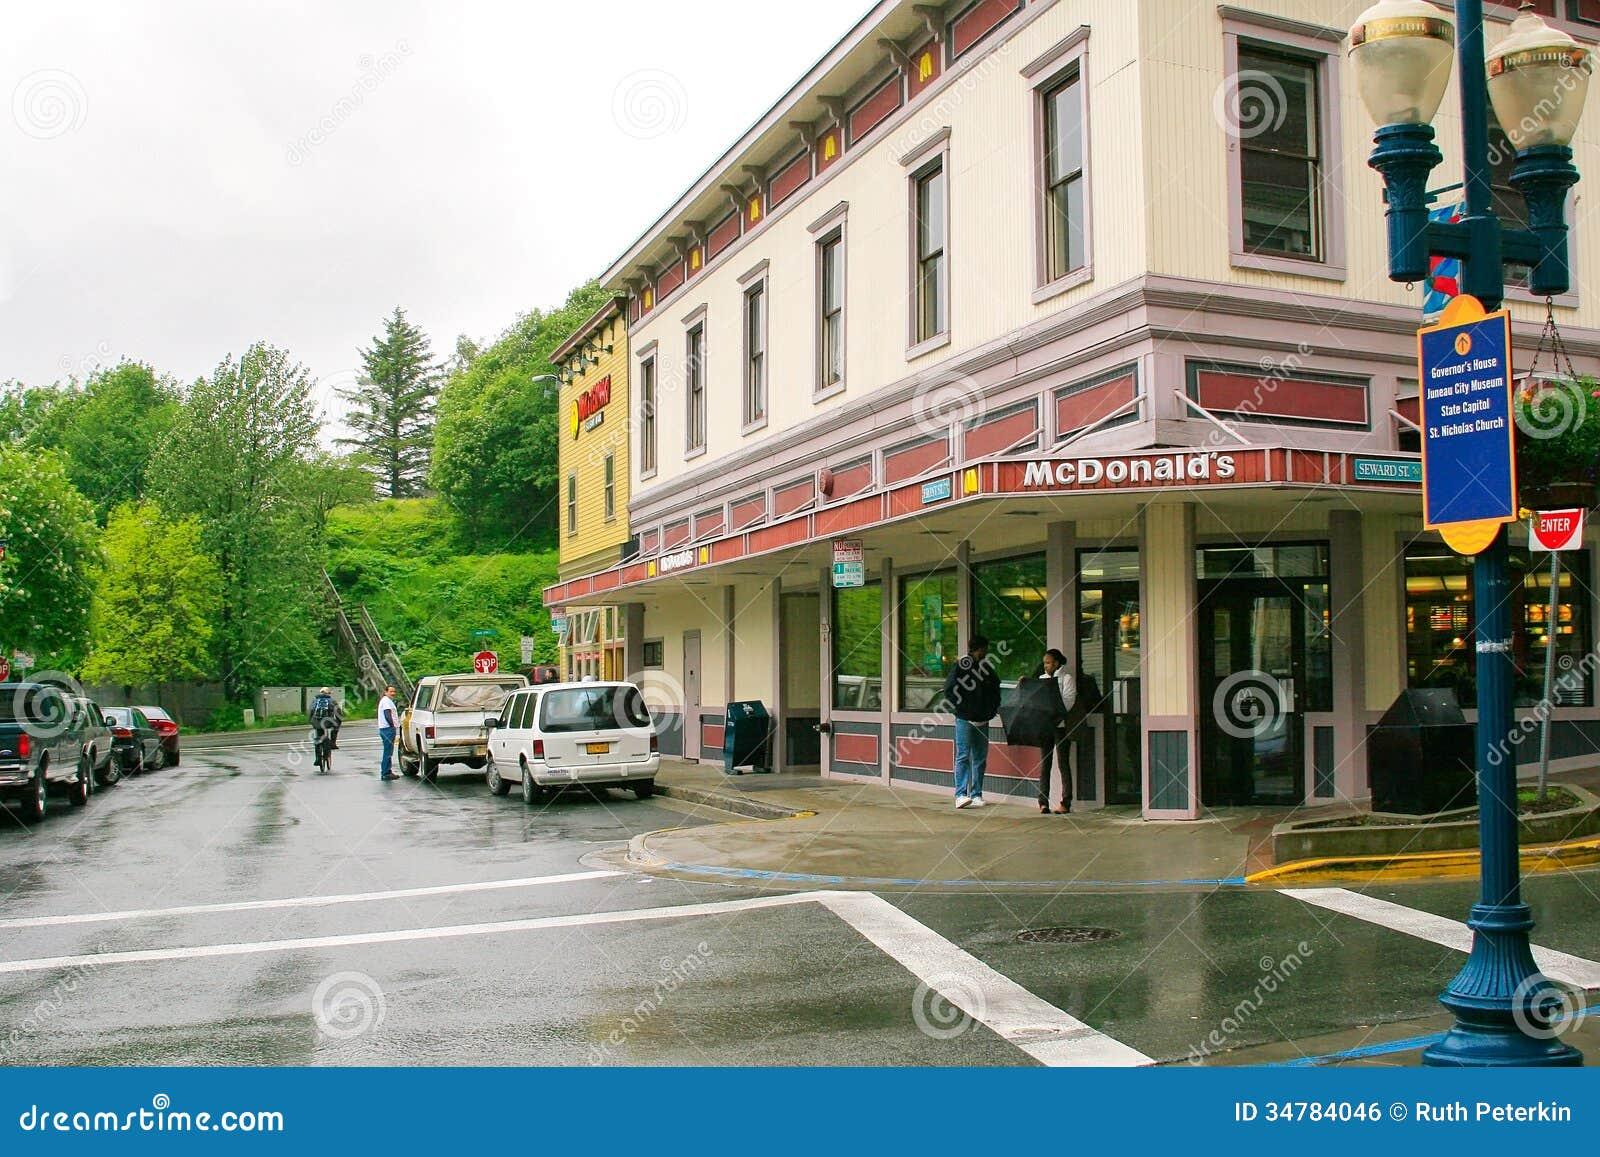 Fast Food Restaurant Corner Of Street